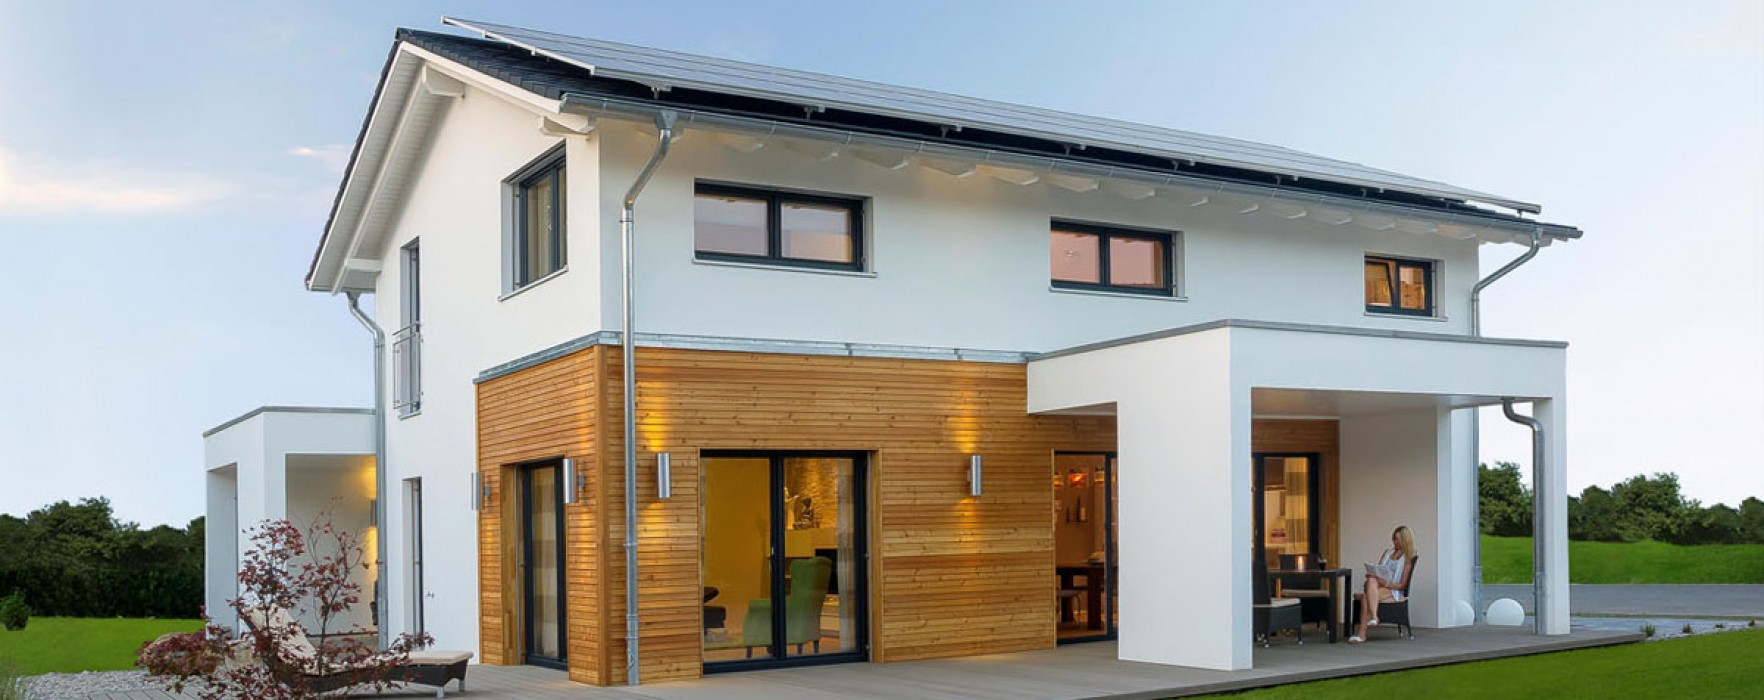 Casa jubil e xxl plus di haas efficienza energetica per for Casa moderna bianca esterno